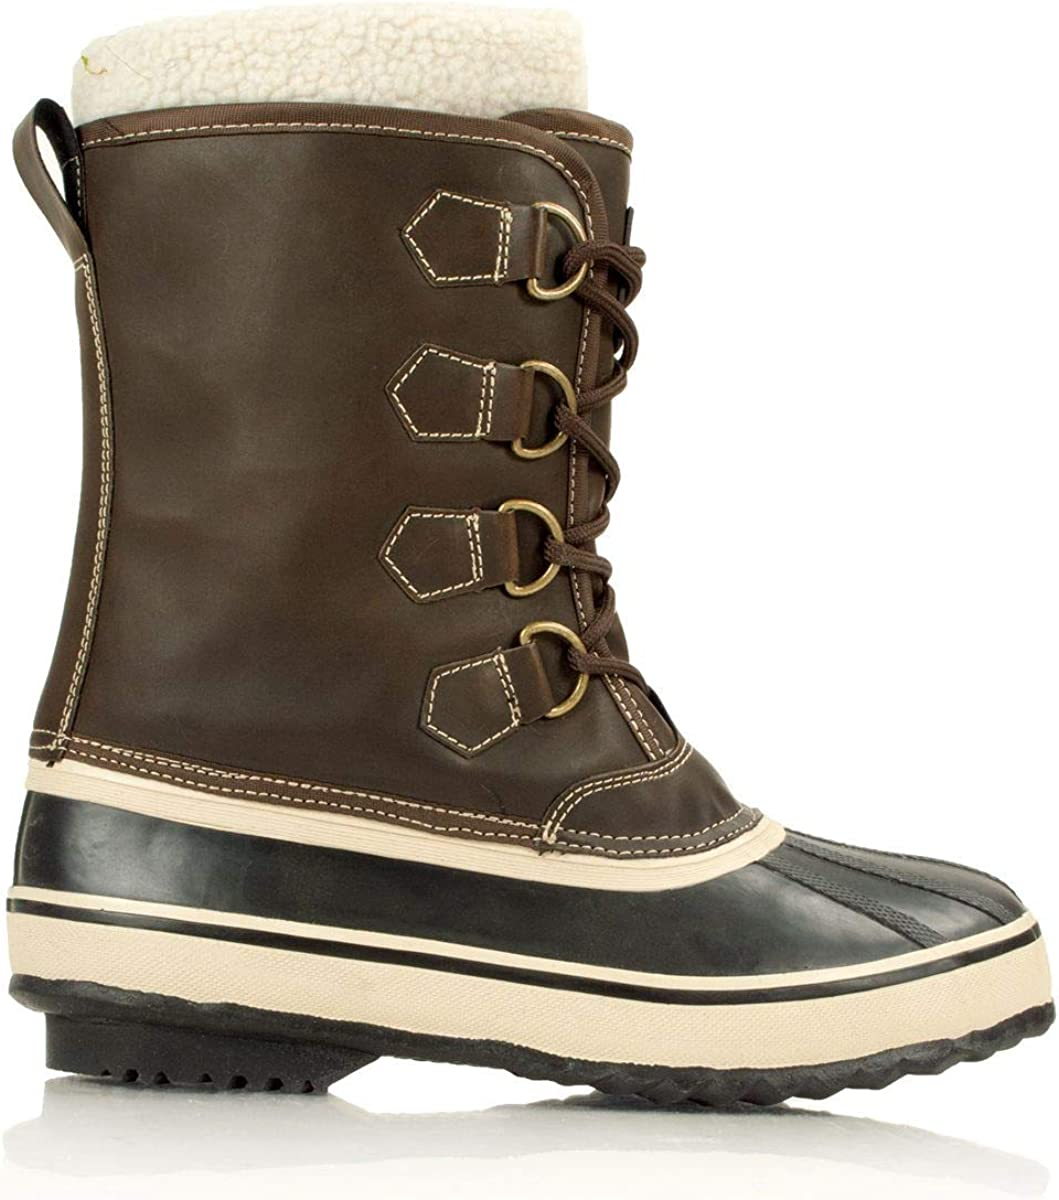 Absolute Canada Men's Nomad Boot Max 50% OFF Overseas parallel import regular item